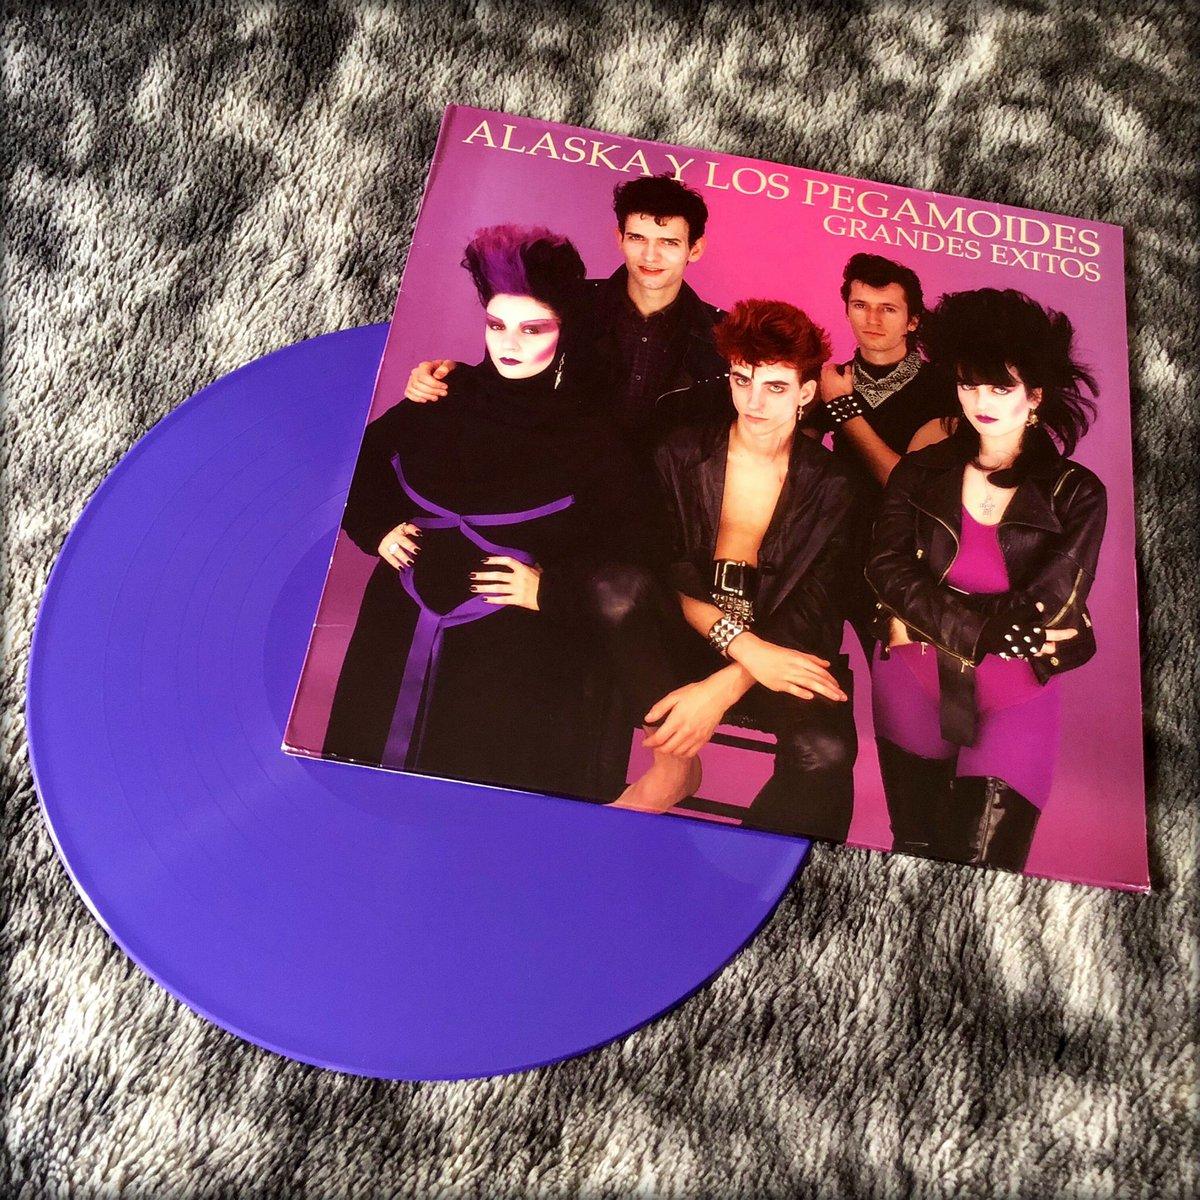 Alaska Y Los Pegamoides - Grandes Éxitos - 1982  #alaska #alaskaylospegamoides #grandesexitos #vinyl #purplevinyl #coloredvinyl #colouredvinyl #vinylcollection #myvinylcollection #ilovevinyl #music #ilovemusicpic.twitter.com/9mBp8ILrKX